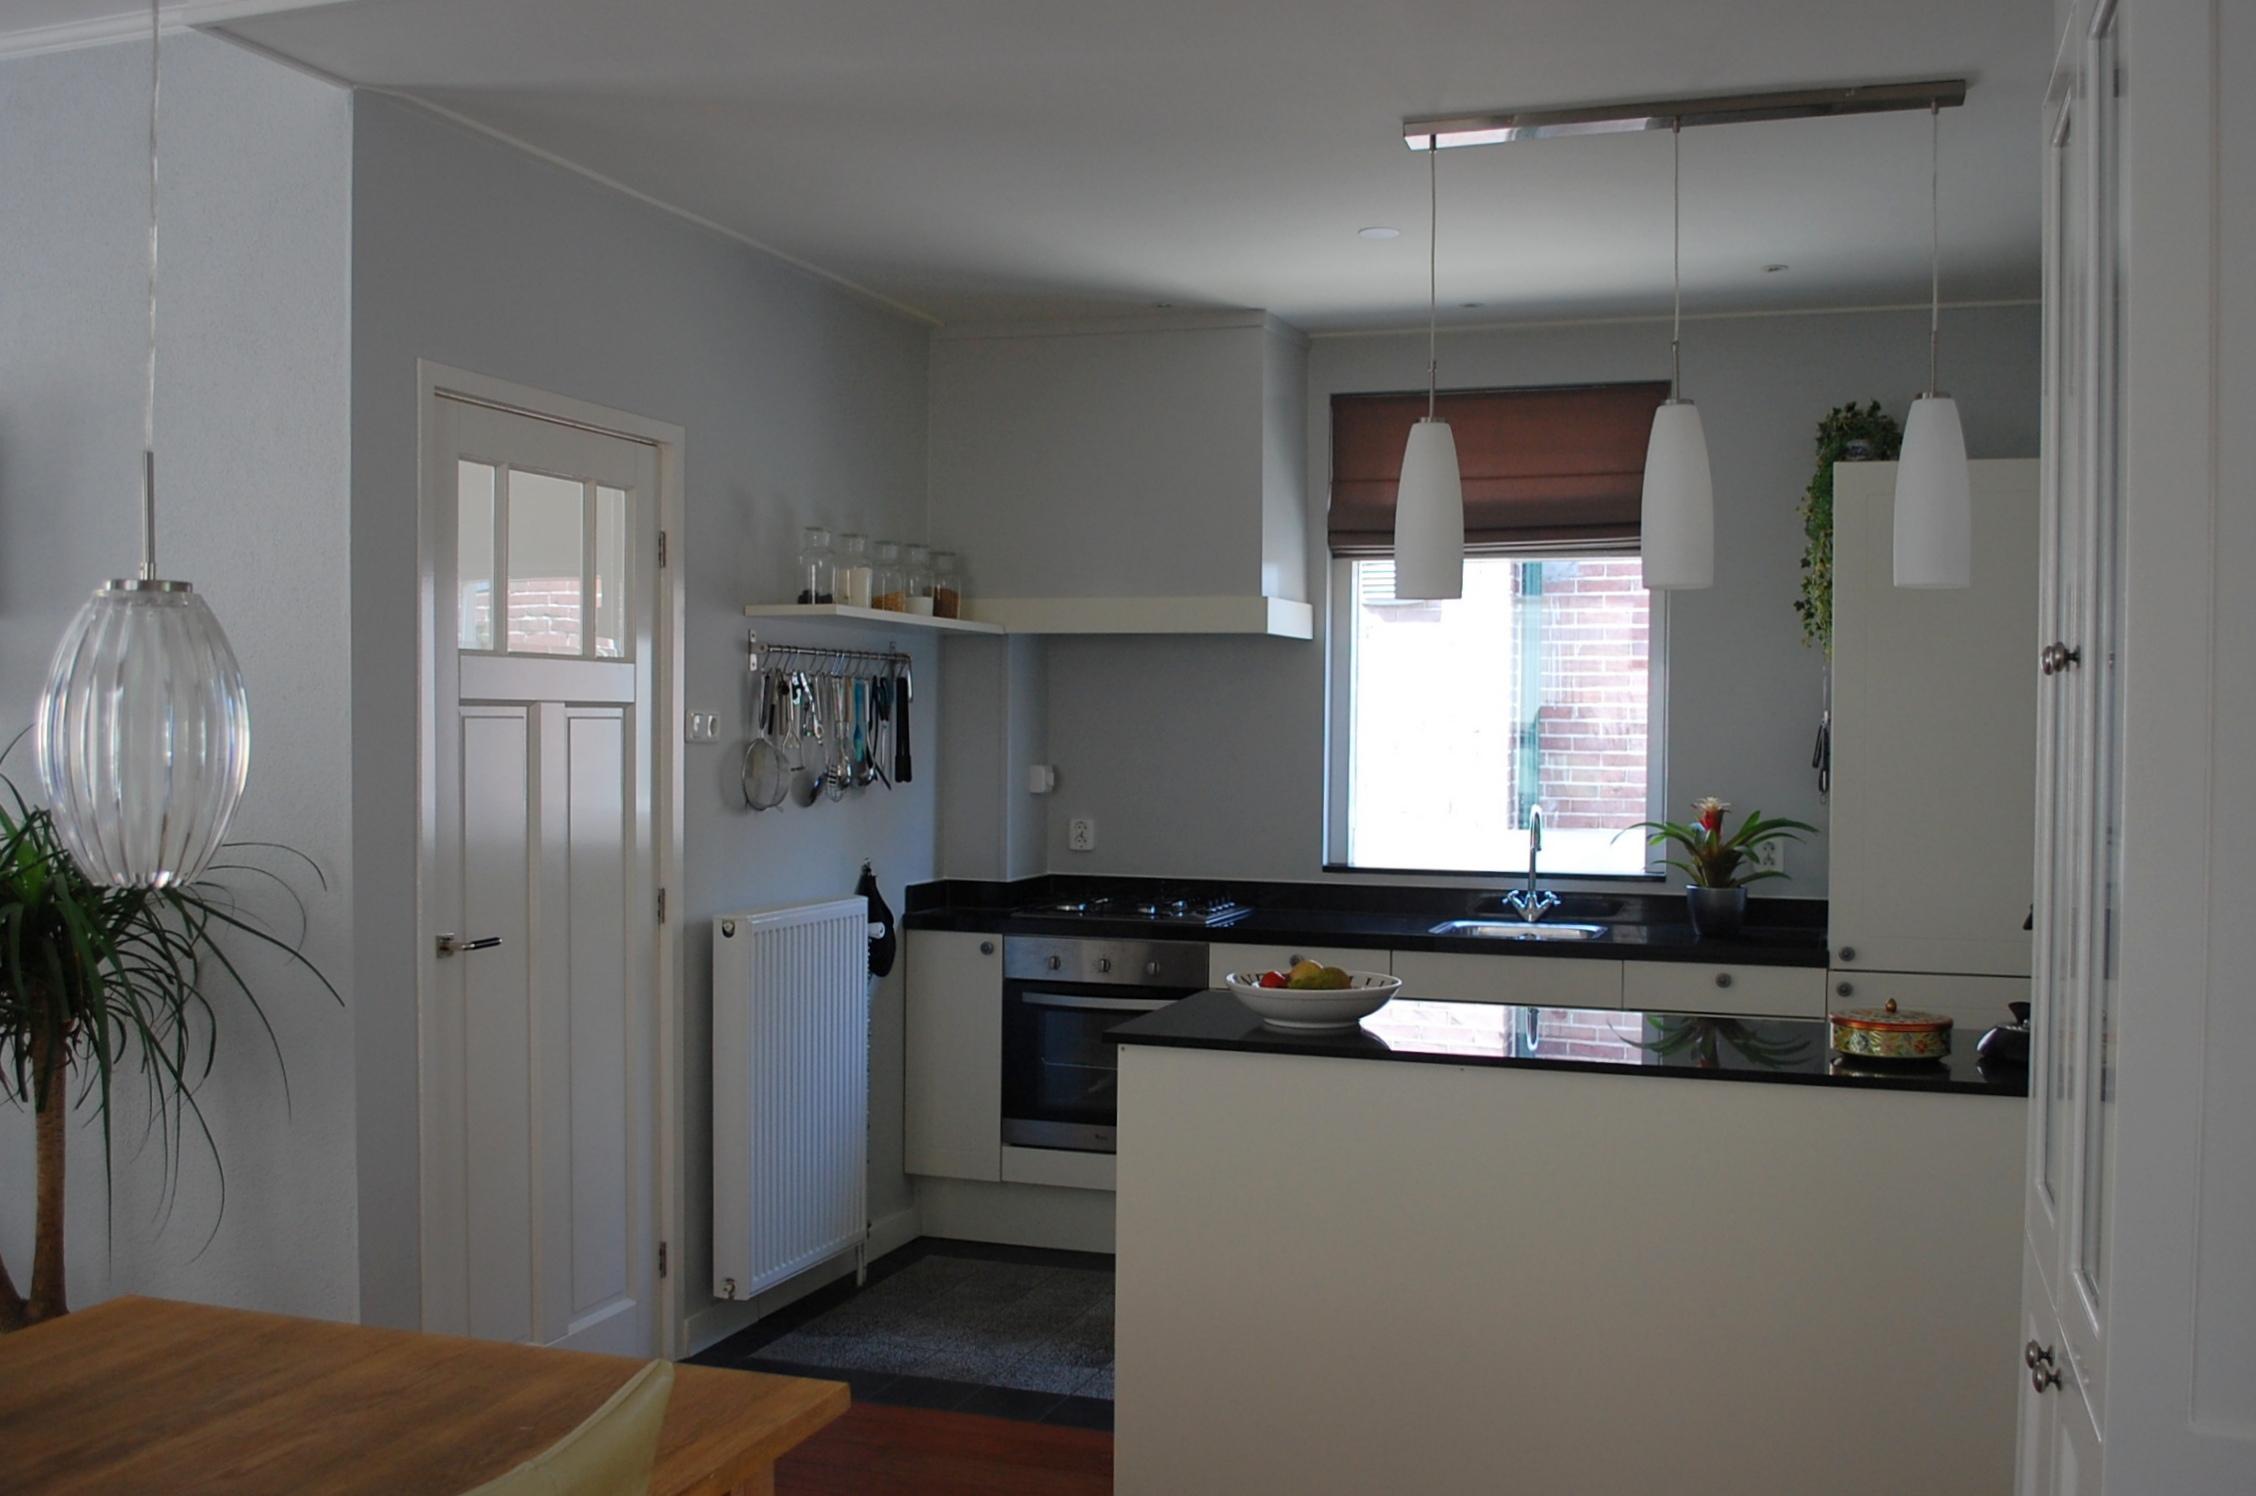 Gordijnen idee keuken - Lounge en keuken in dezelfde kamer ...